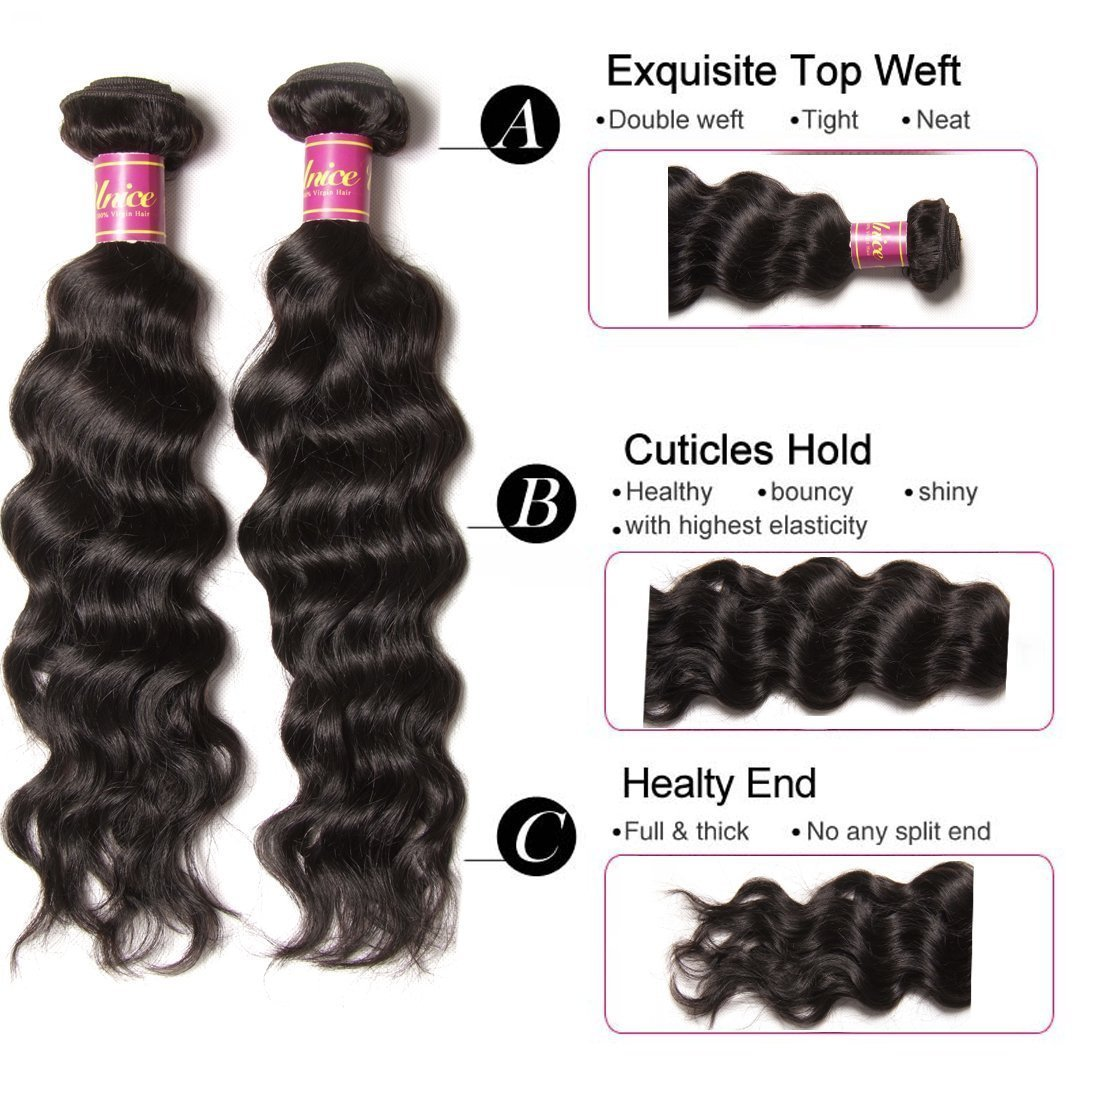 Unice 7A Grade Brazilian Natural Wave Hair 100% Virgin Human Hair 3 Bundles with Closure Natural Color (20 22 24+18Free Closure) by UNICE (Image #4)